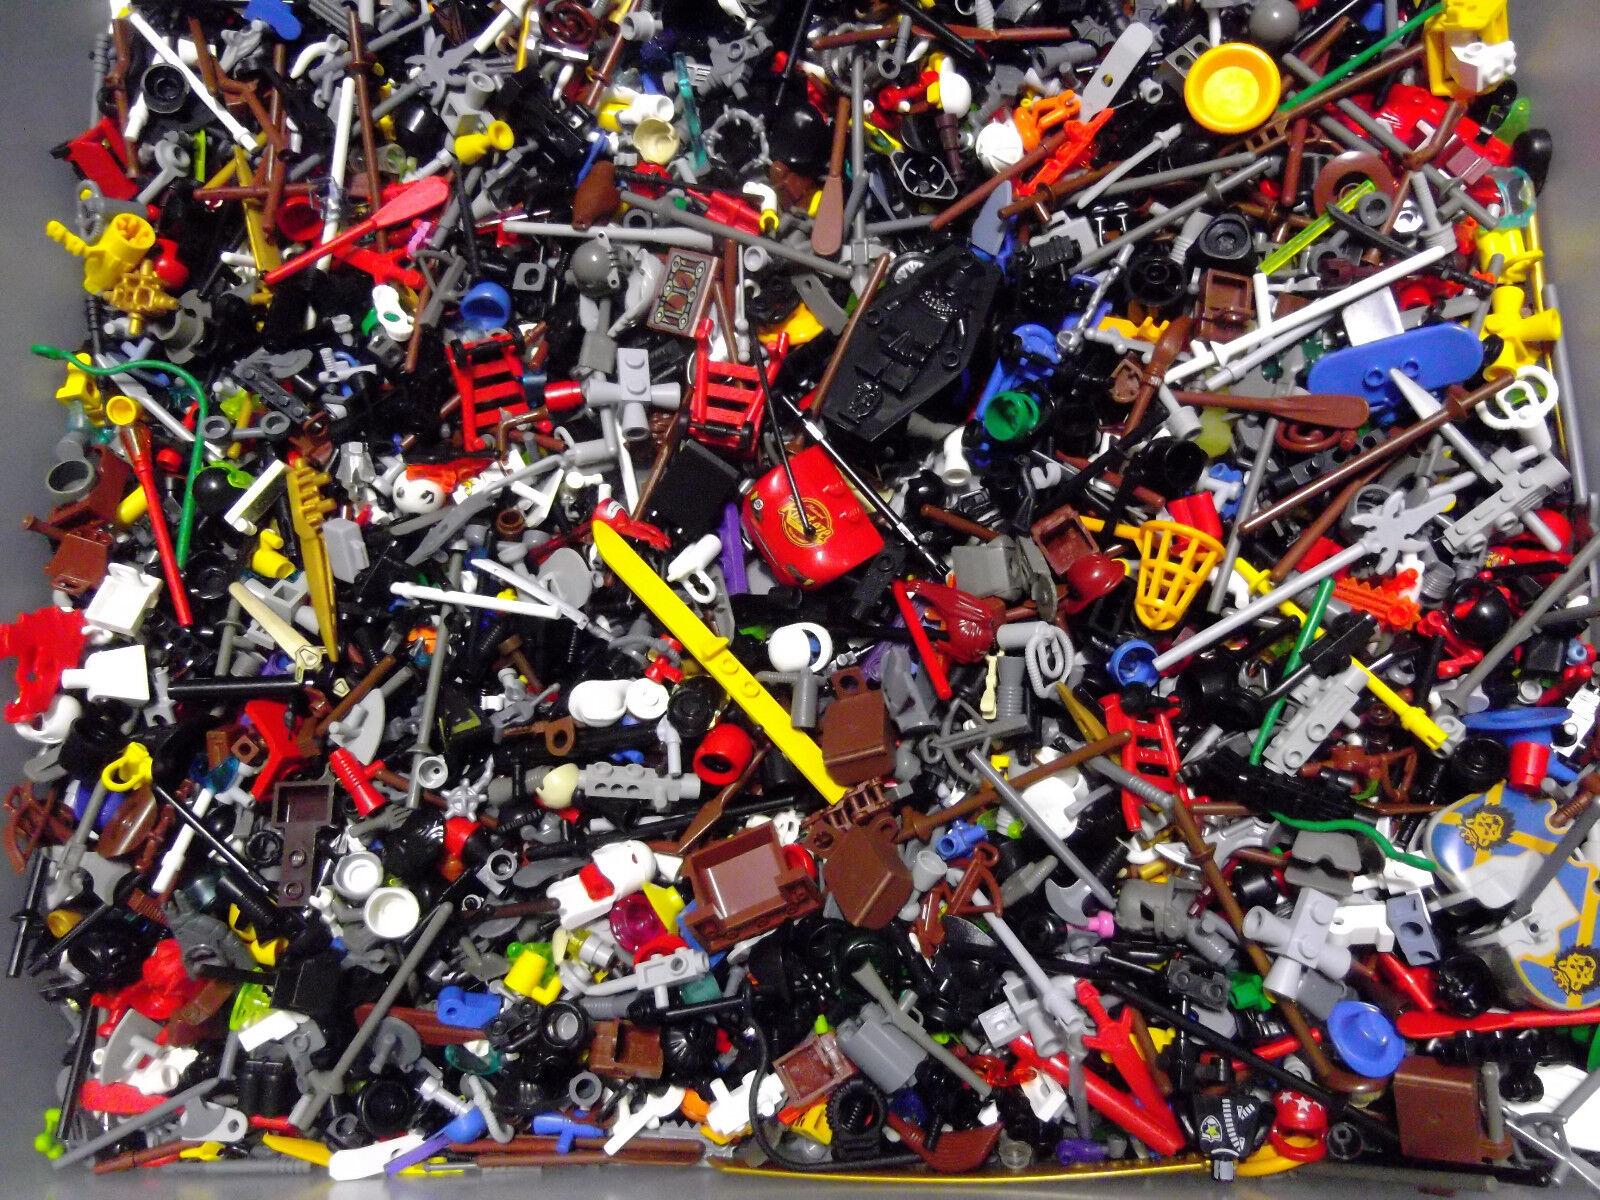 ☀️WOW 500x RANDOM LEGO MINIFIG Accessories BULK LOT MINIFIGURES MINI FIGURE